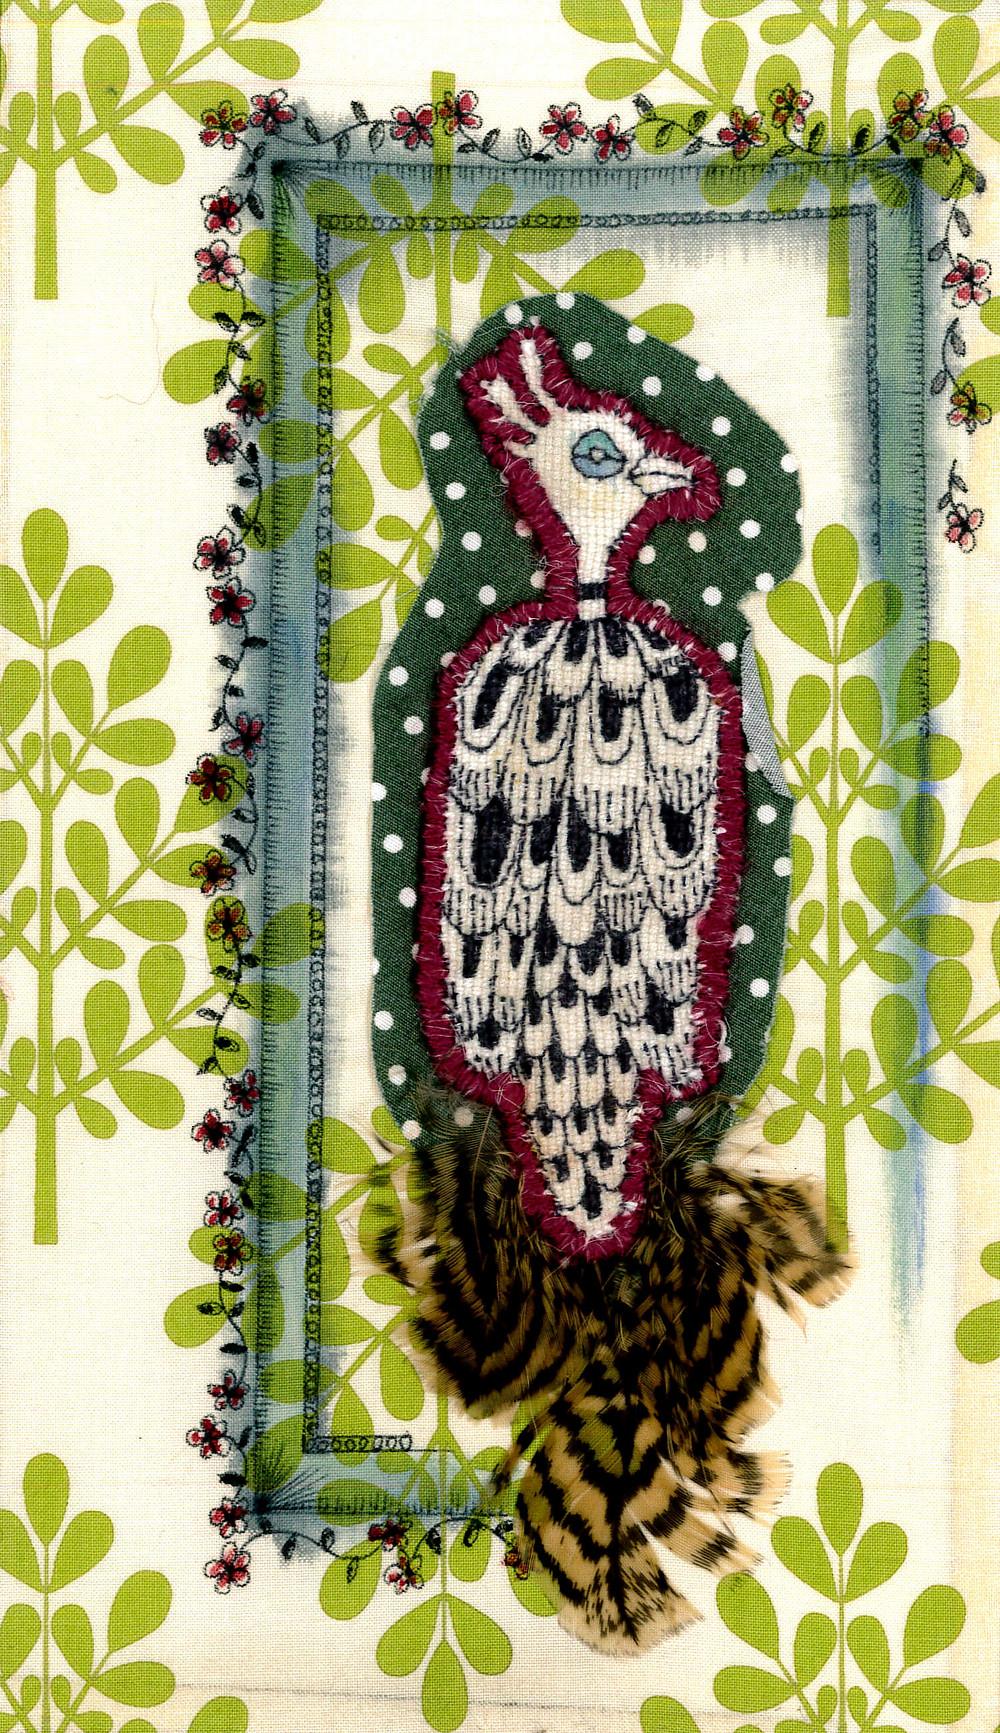 textile illustration hand sewn embroidery bird